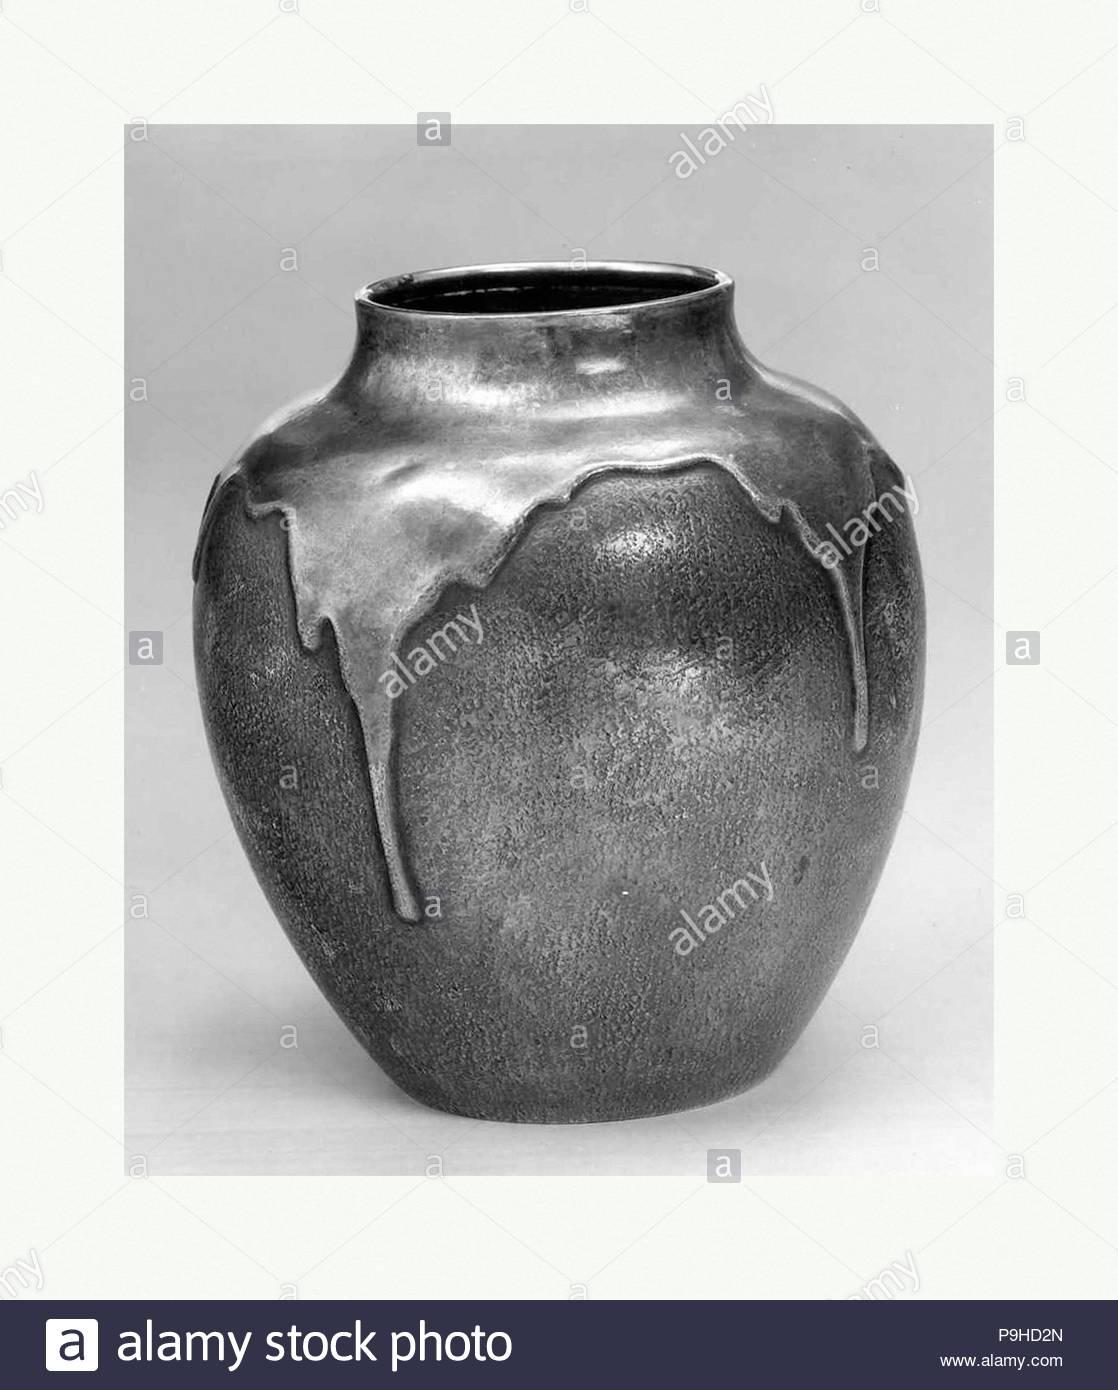 Cruche d eau, période Meiji (1868-1912), fin du xixe siècle, le Japon, l  argent, H. 6 1 2 in. (16,5 cm)   O. 5 1 2 in. (14 cm)   W. (à la base) 3. c73461af625